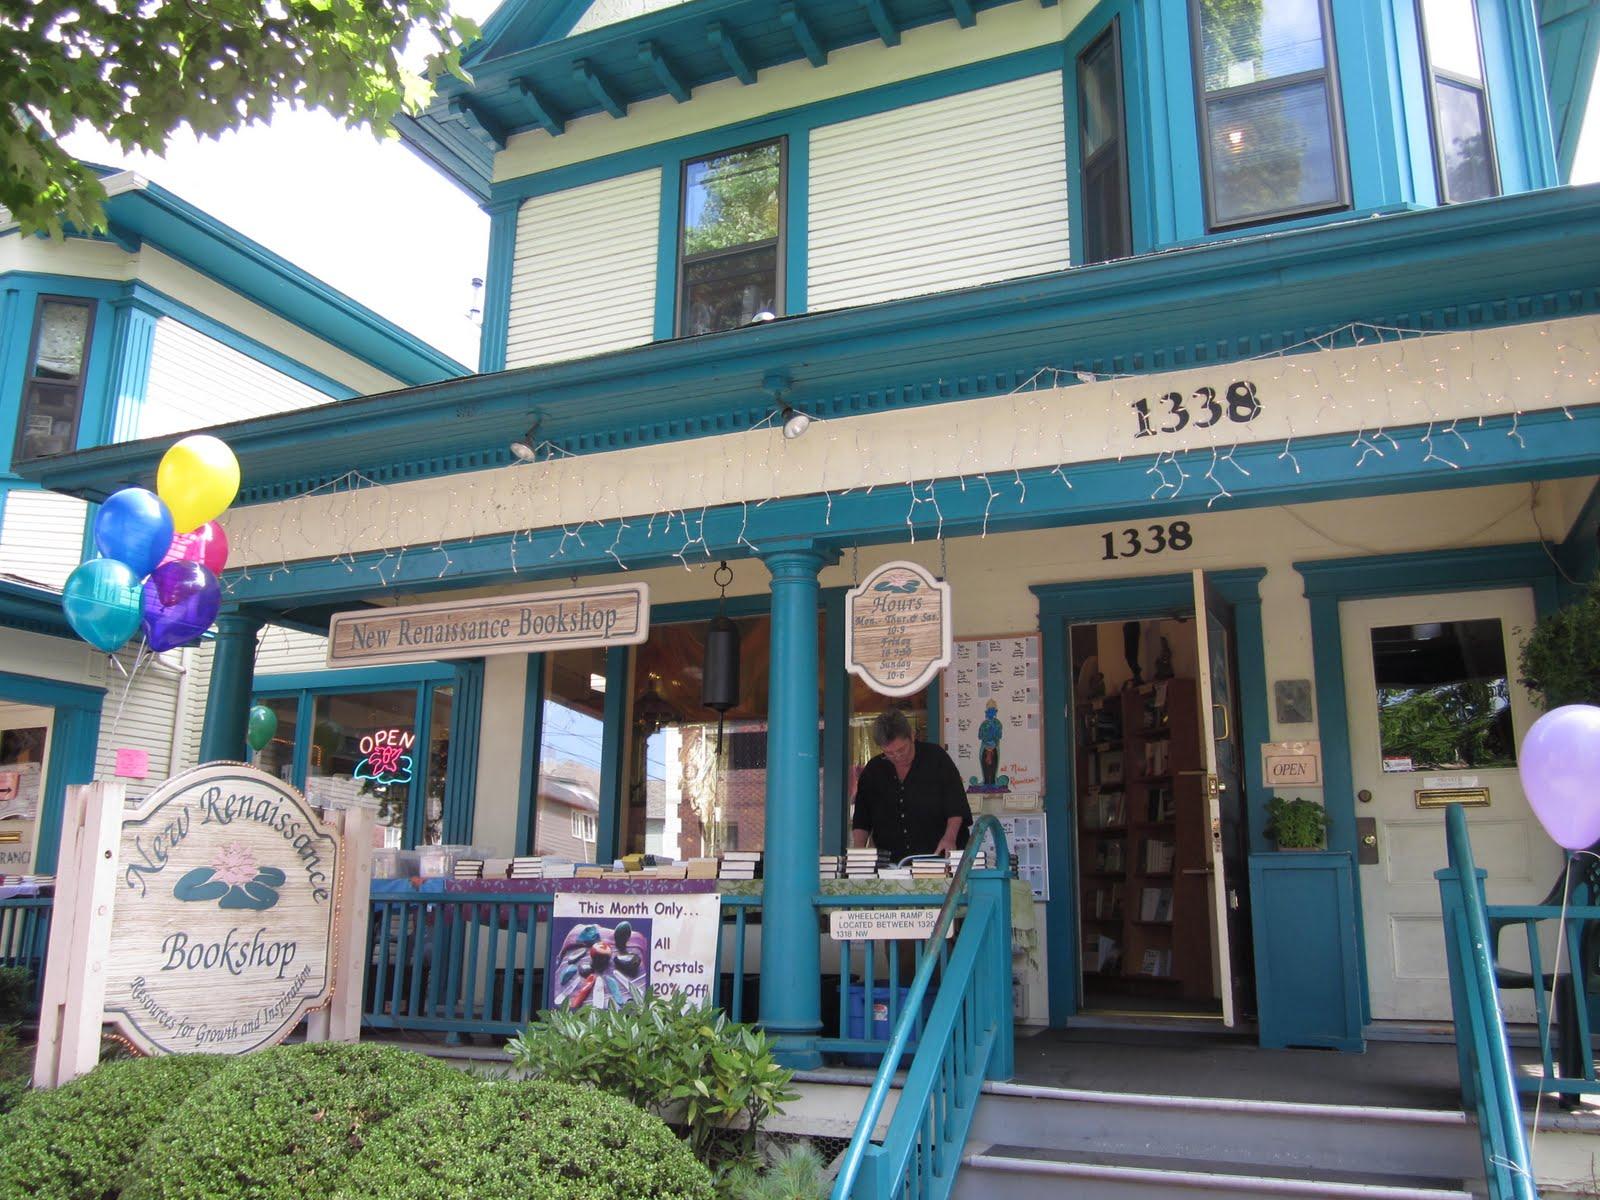 New Ren Bookshop